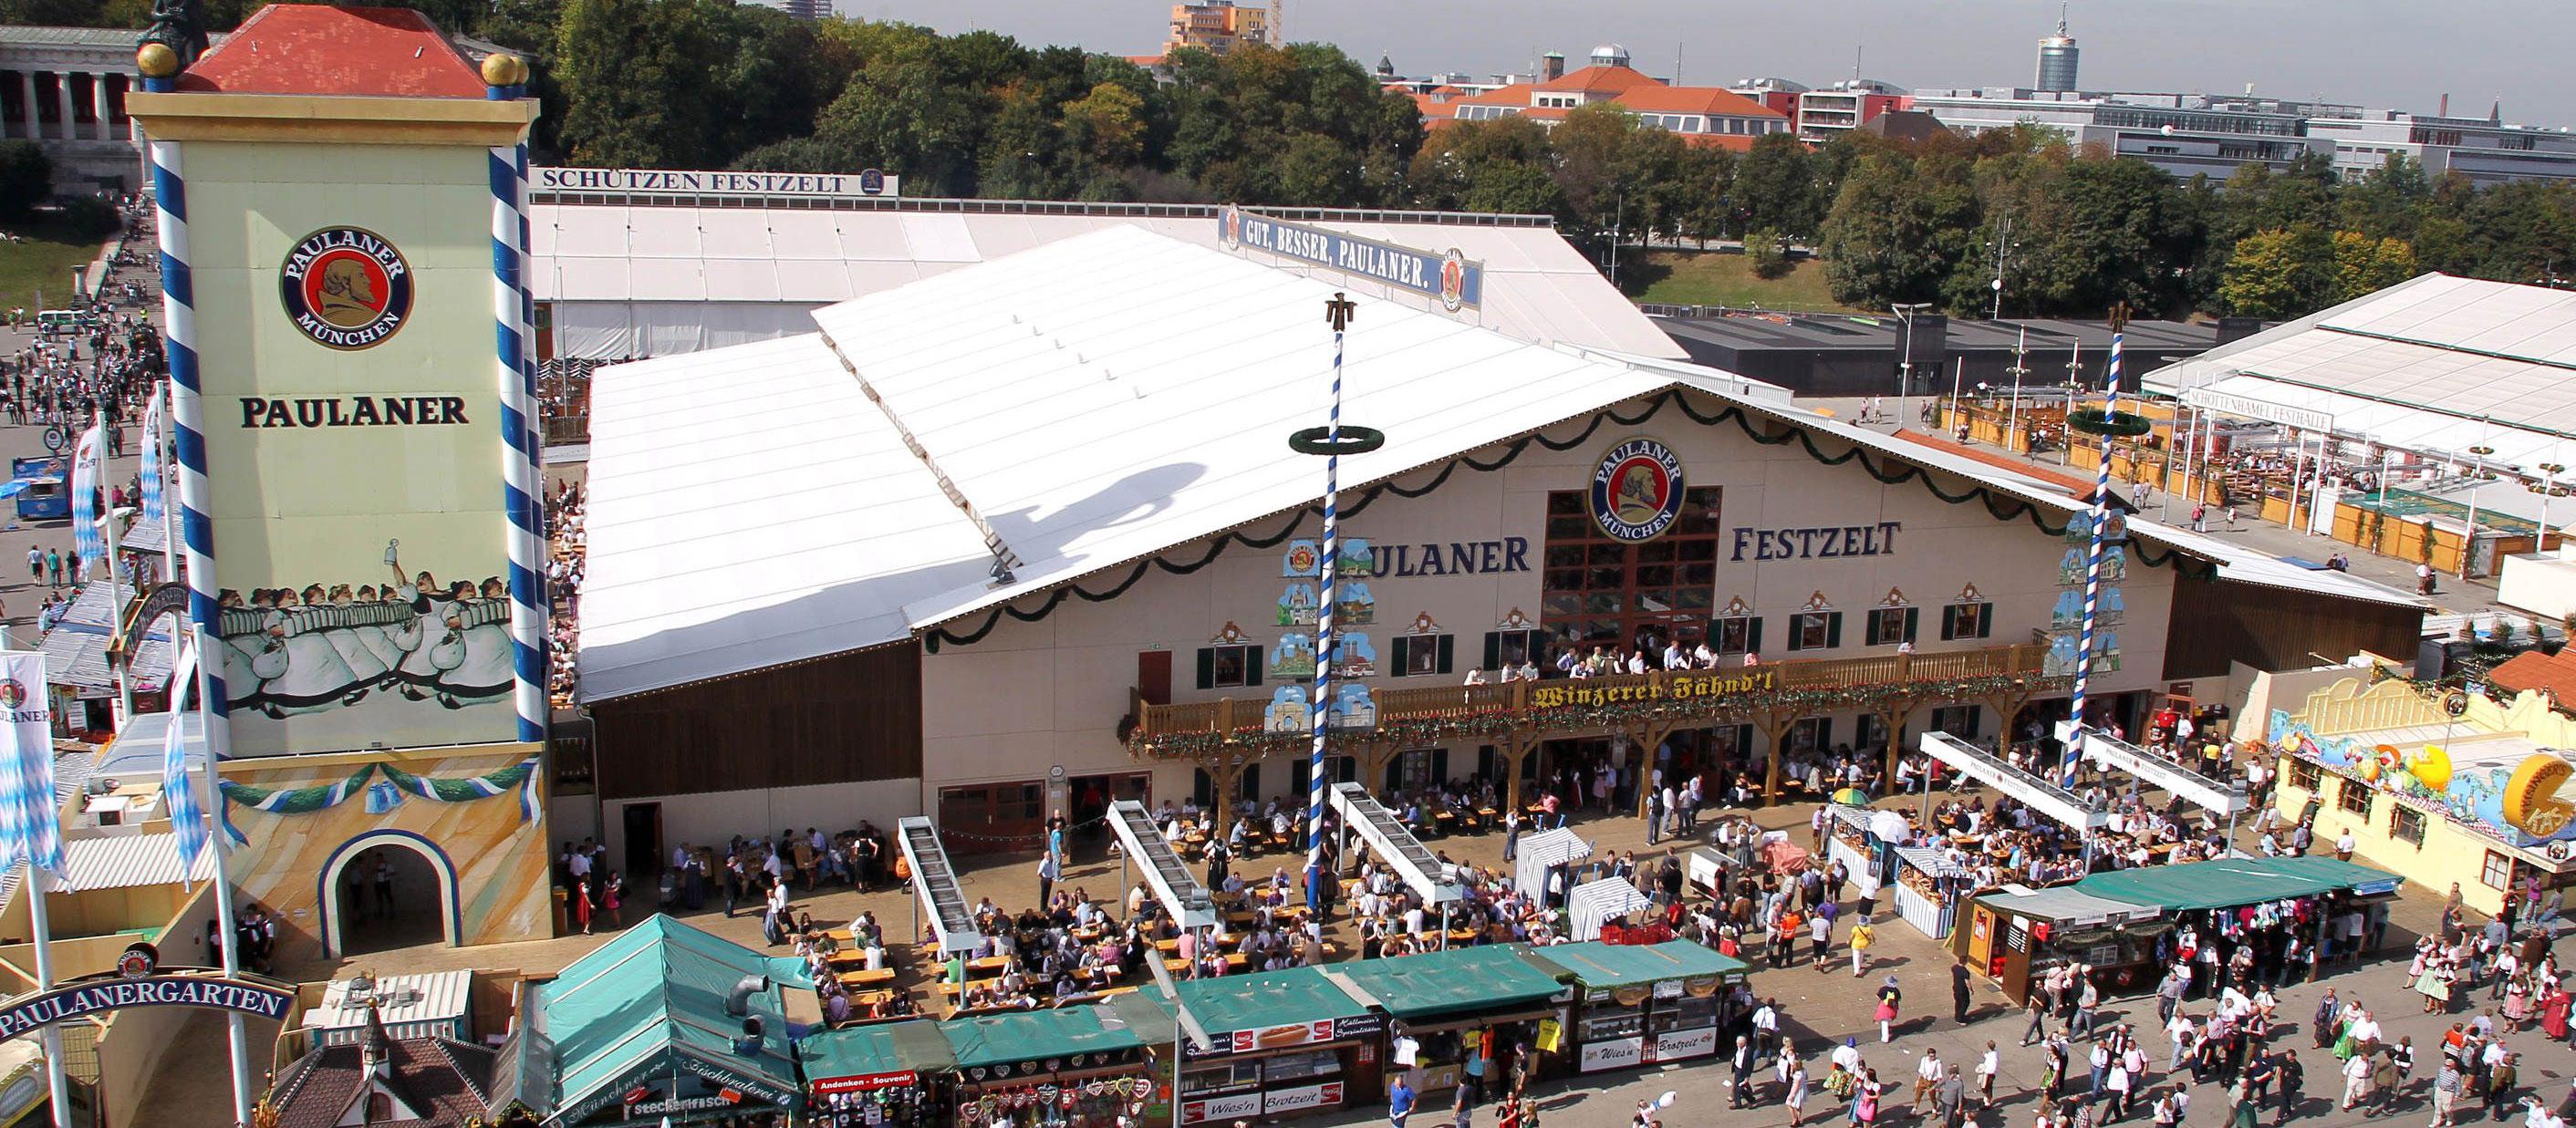 & WINZERER FÄHNDL - Oktoberfest